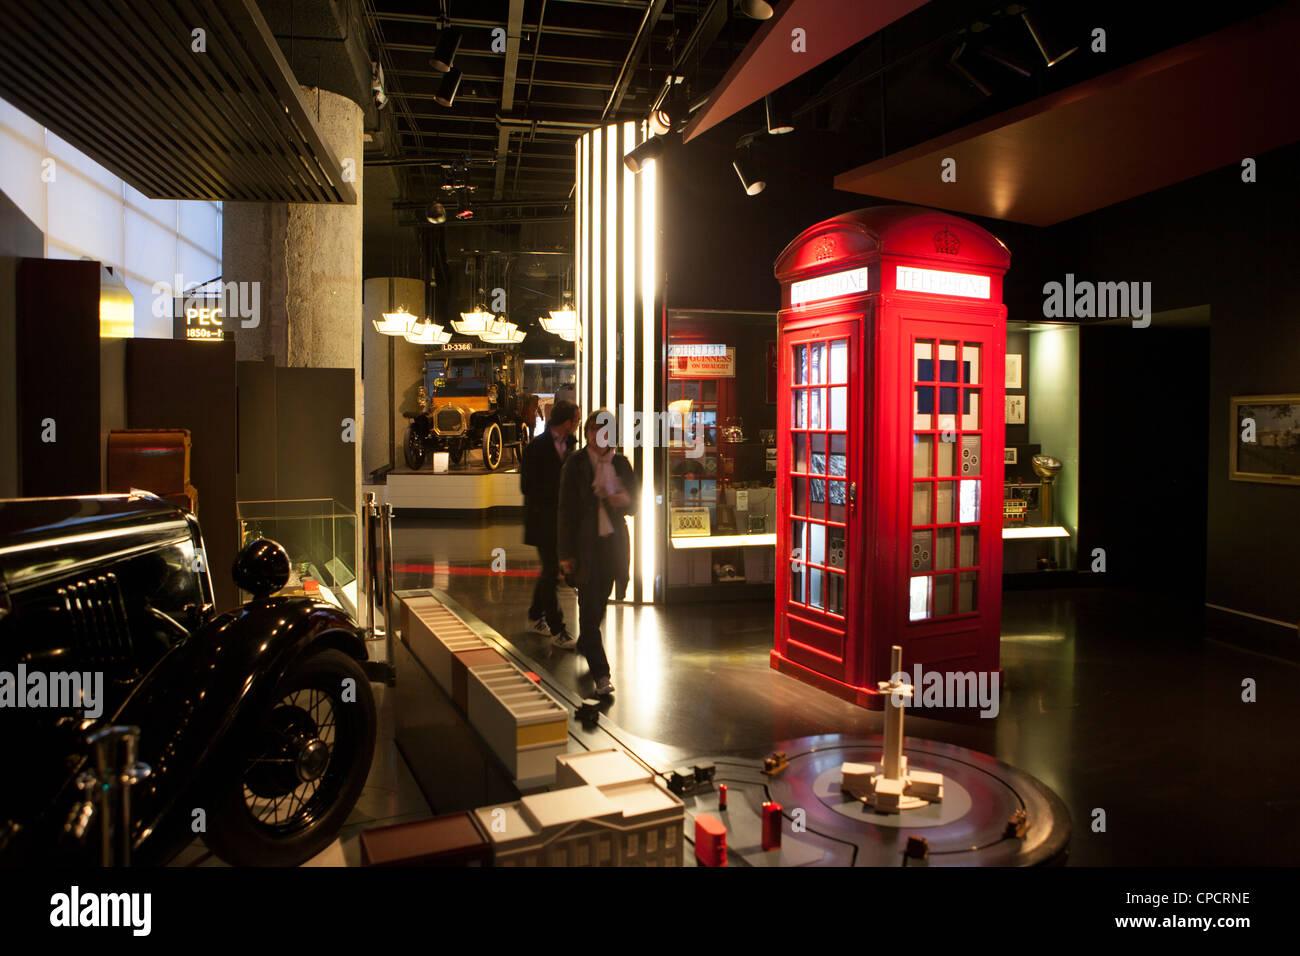 Museum of London - Stock Image